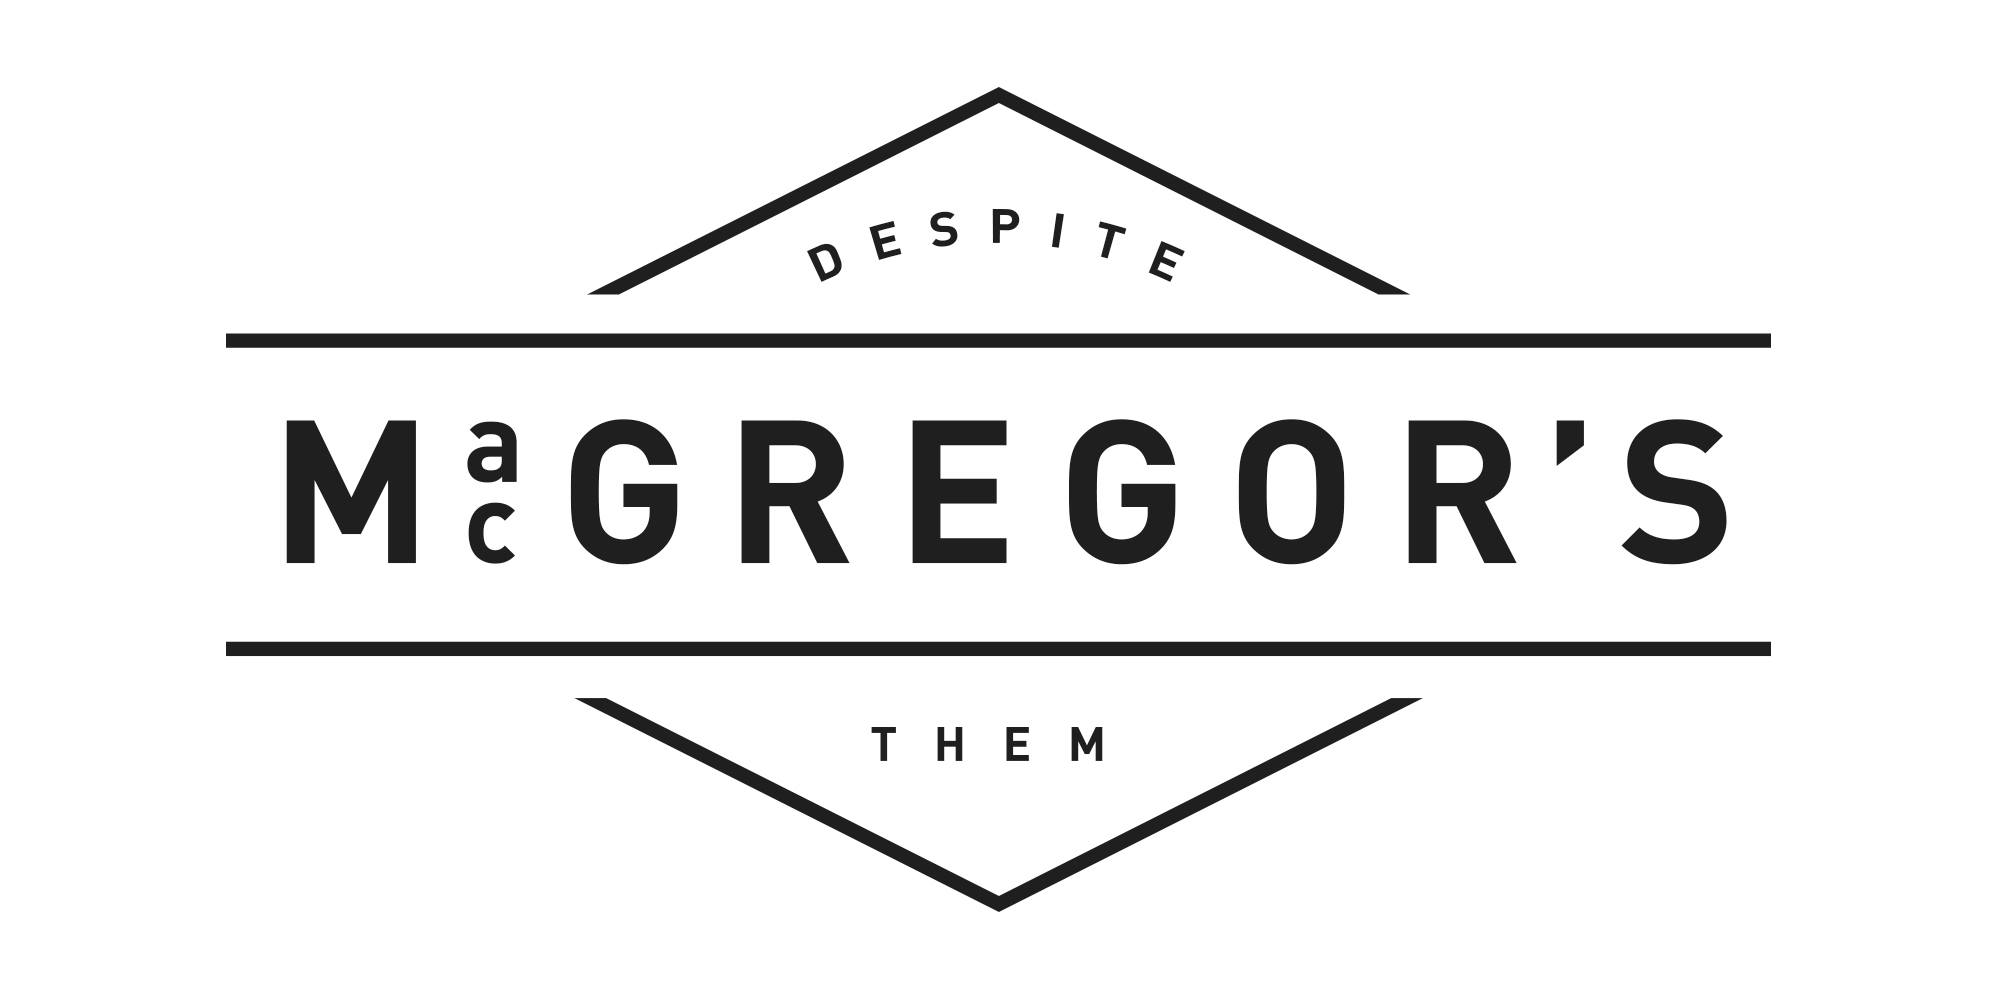 MacGregor's Bar logo